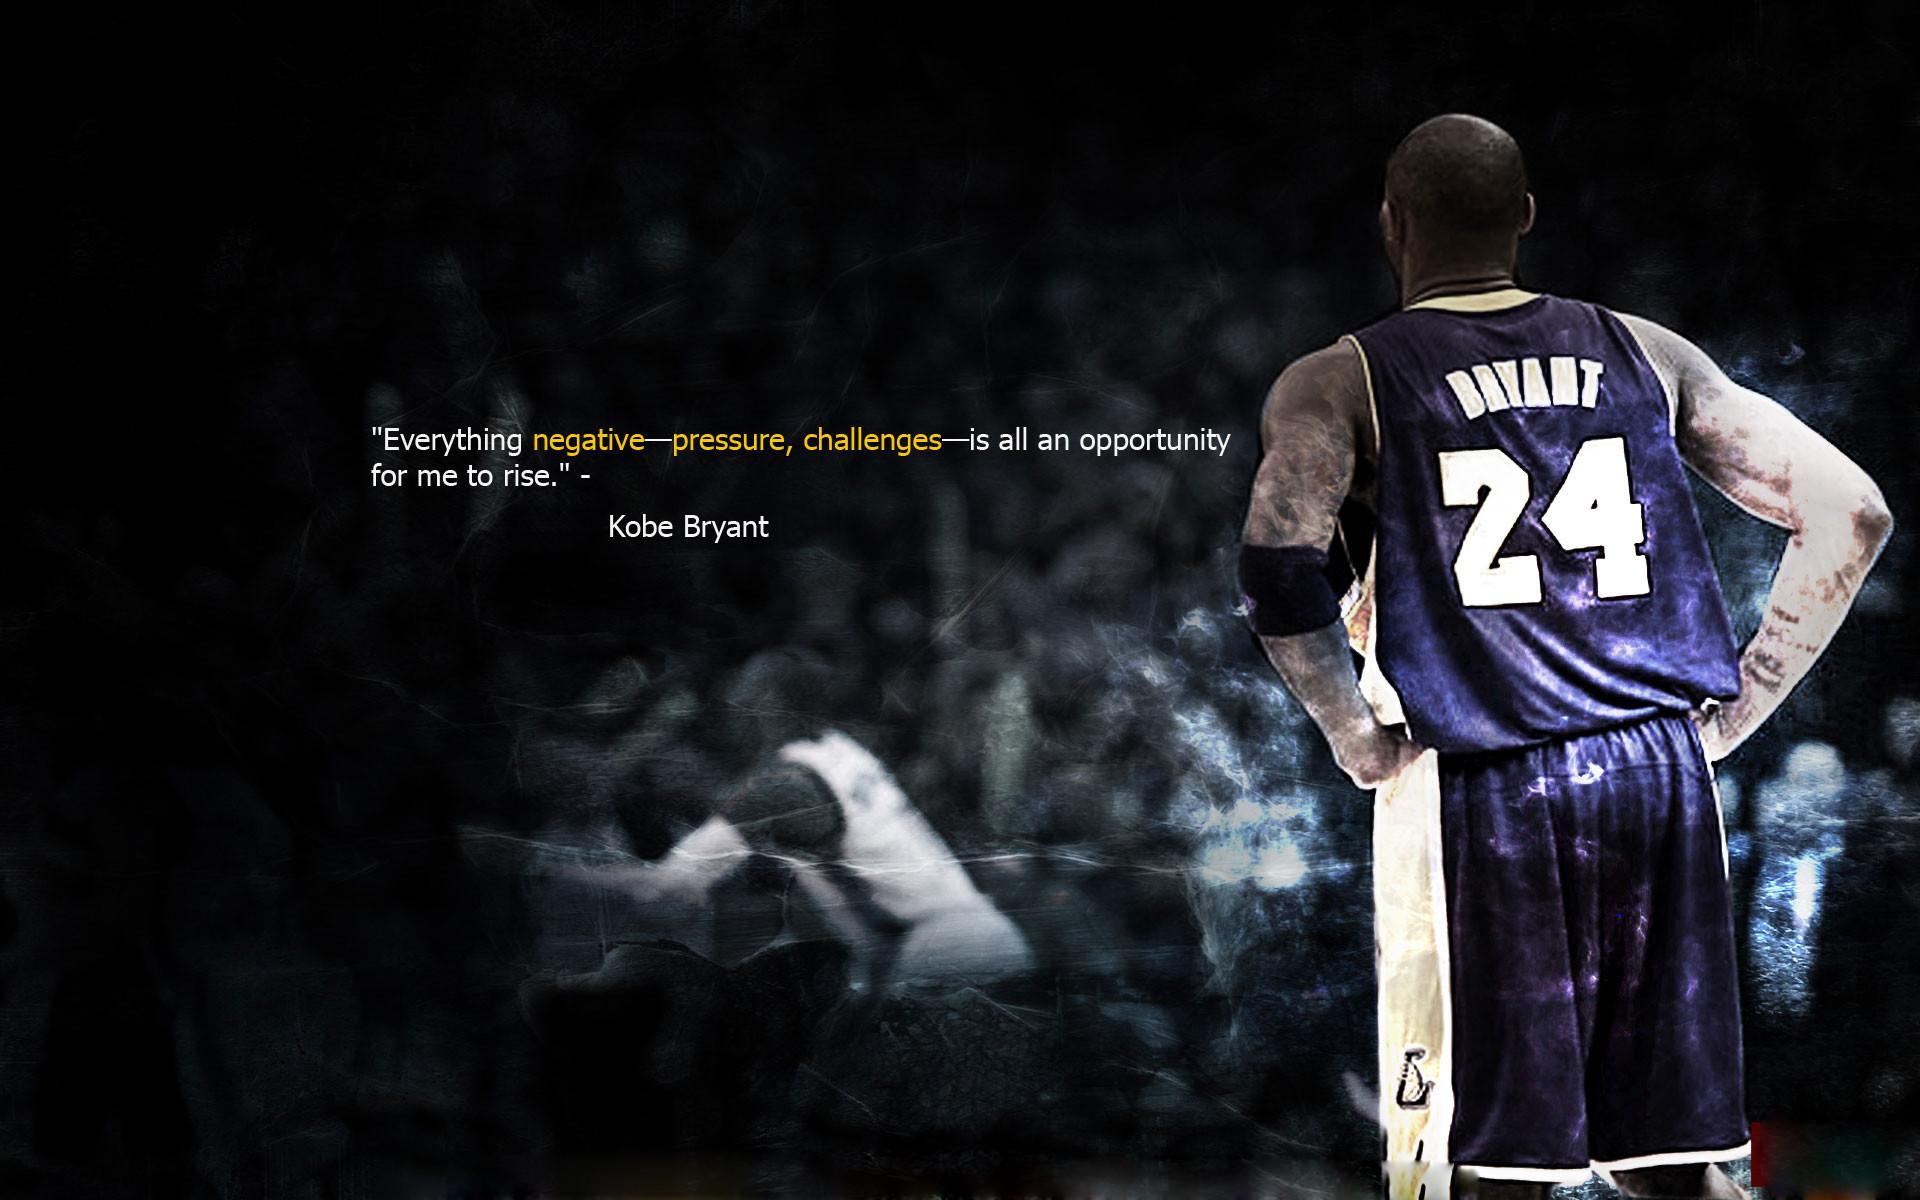 Kobe Bryant Cartoon Wallpaper Posted By Ryan Anderson